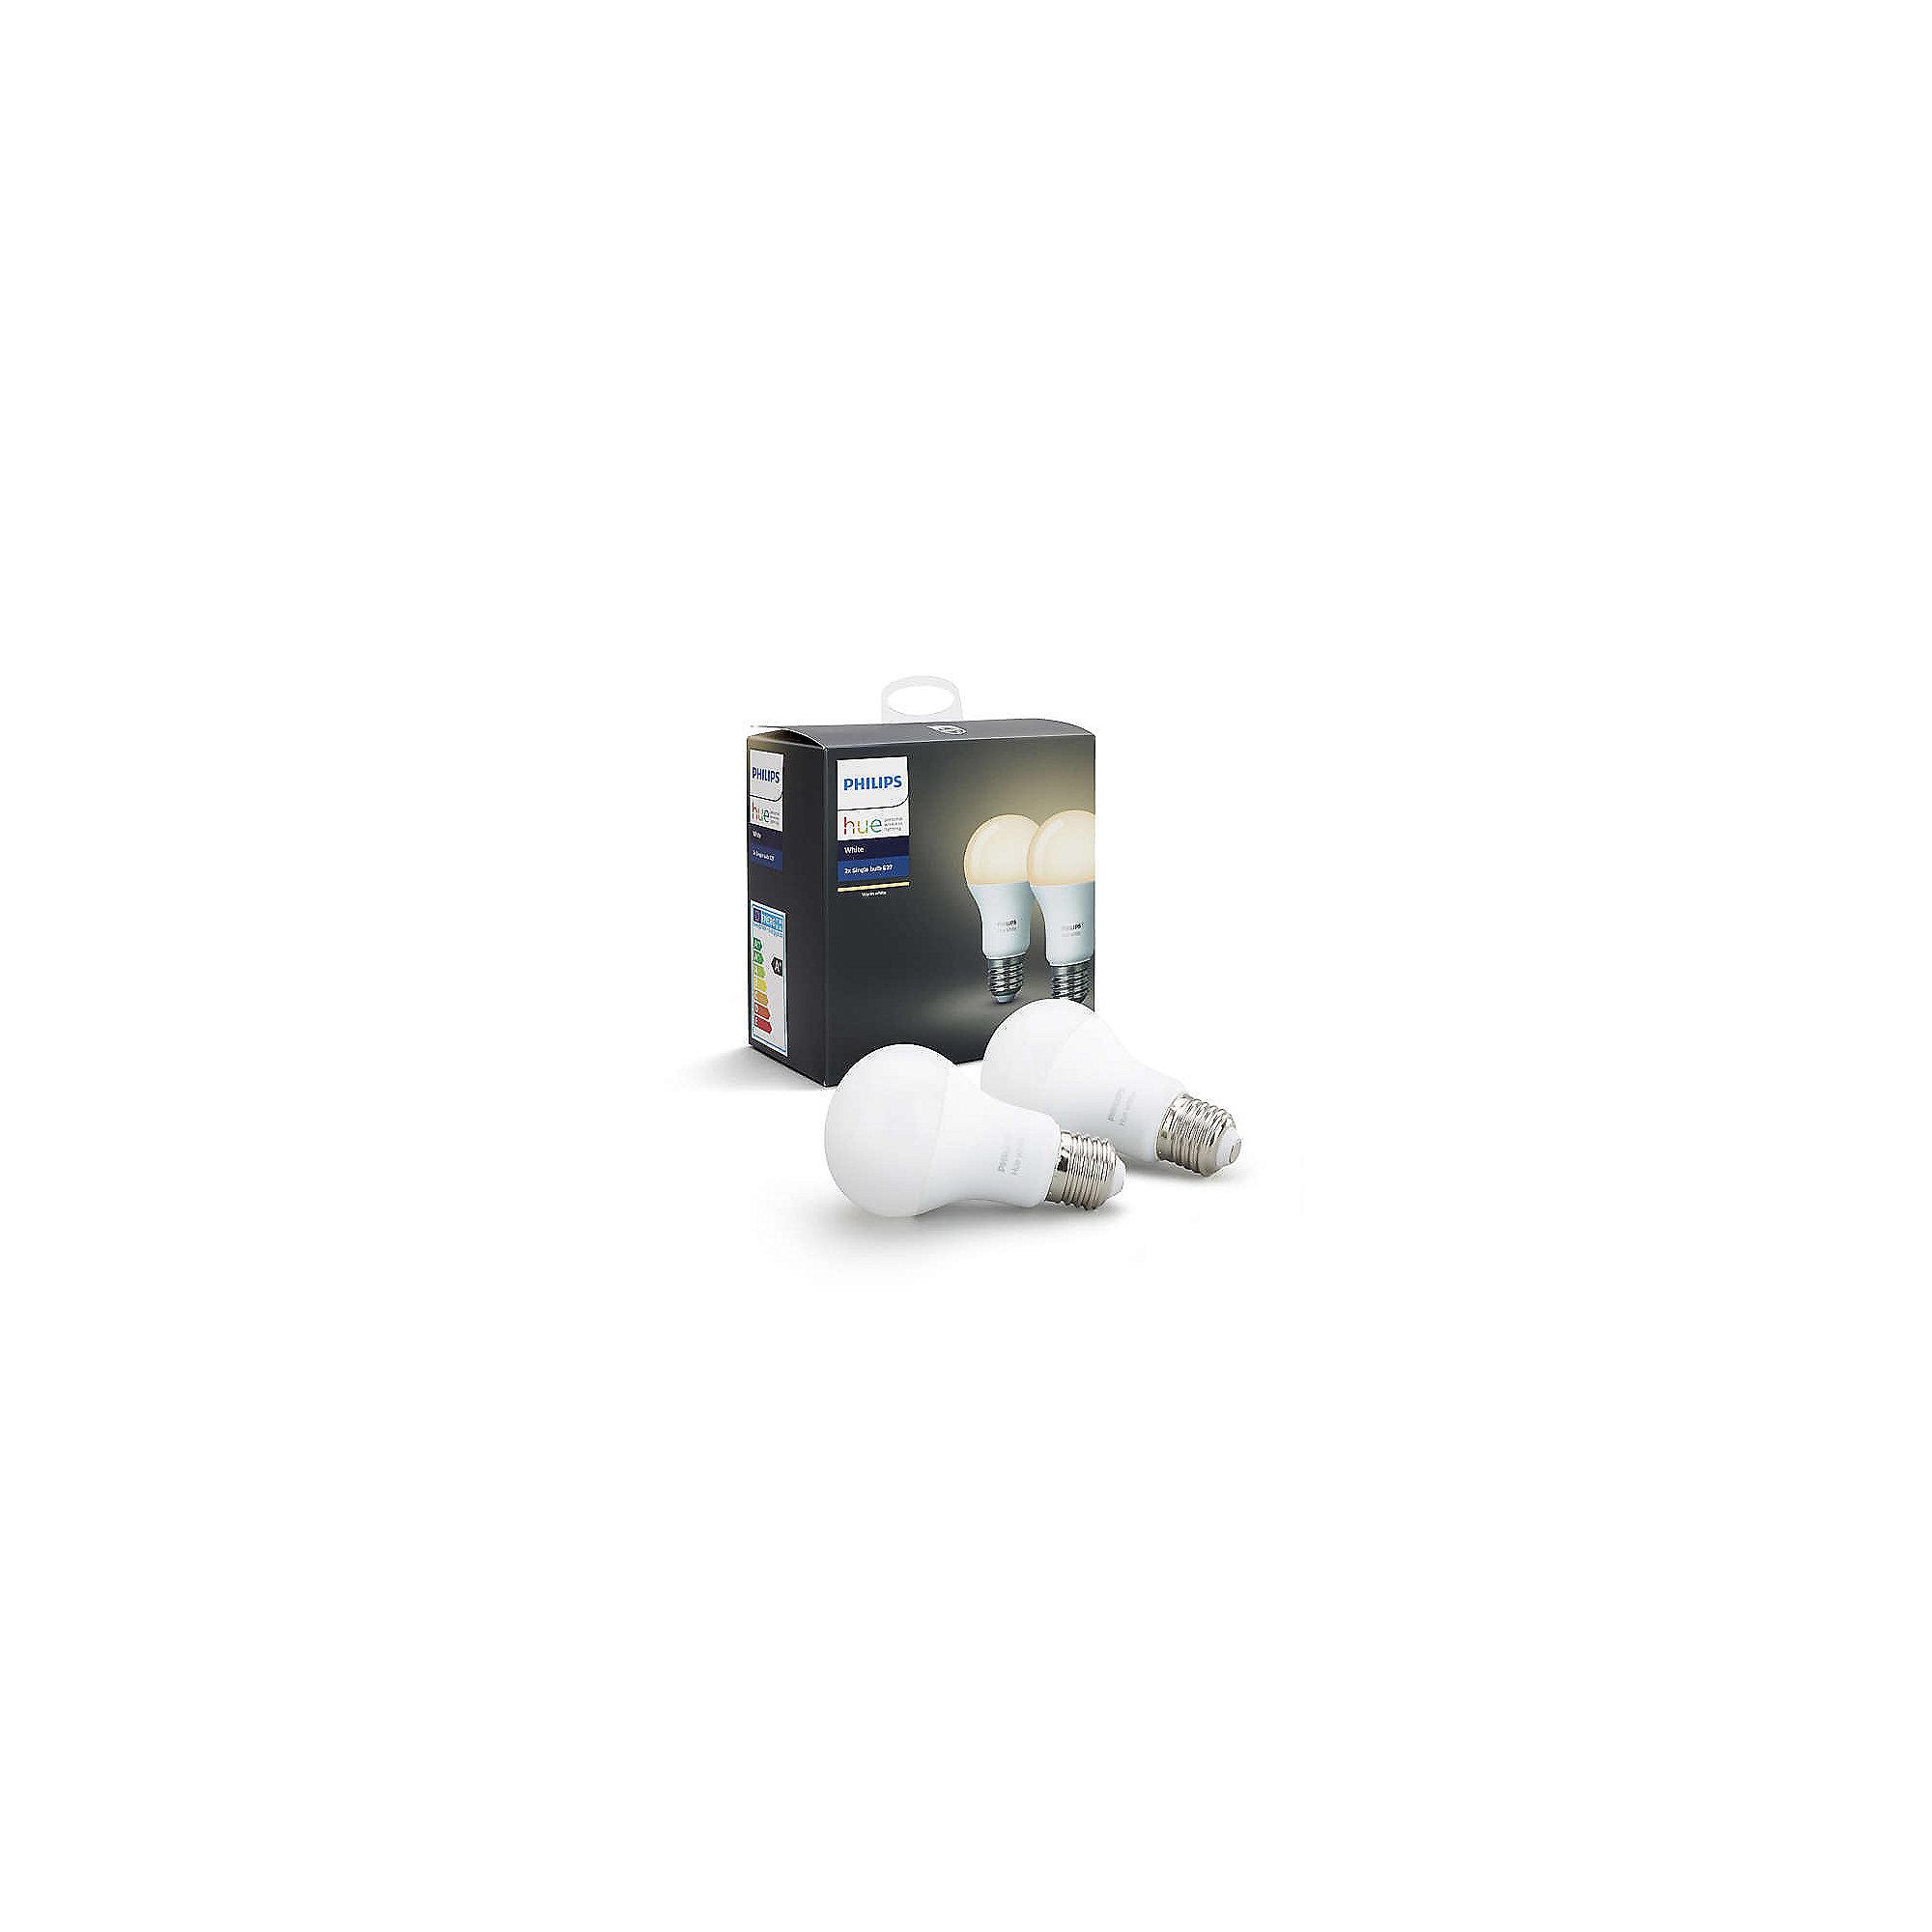 philips hue white e27 led lampe doppelpack cyberport. Black Bedroom Furniture Sets. Home Design Ideas